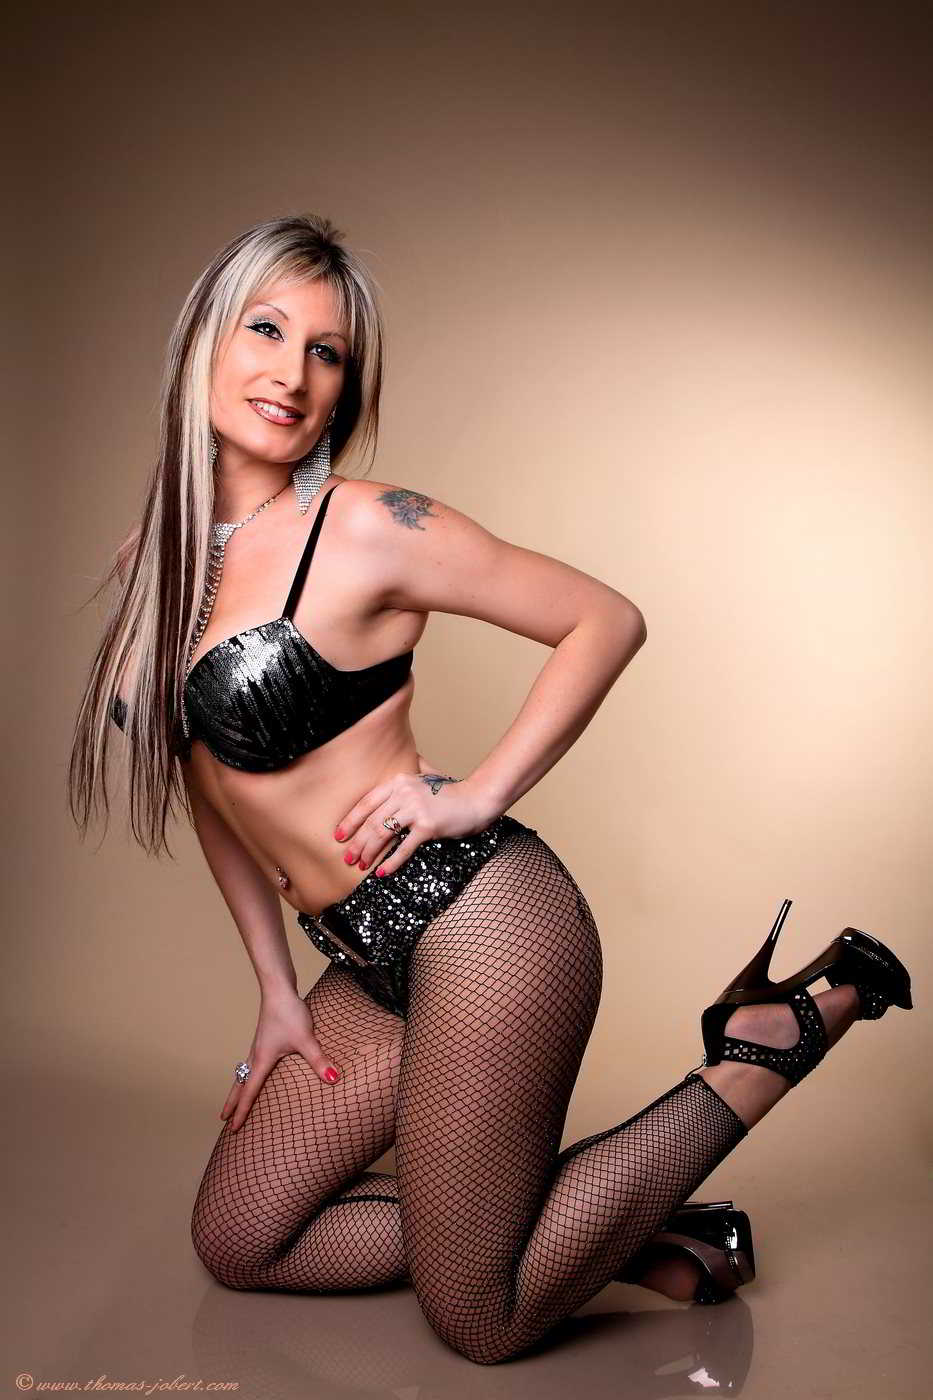 Stripteaseuse Chalon-sur-Saone Luana